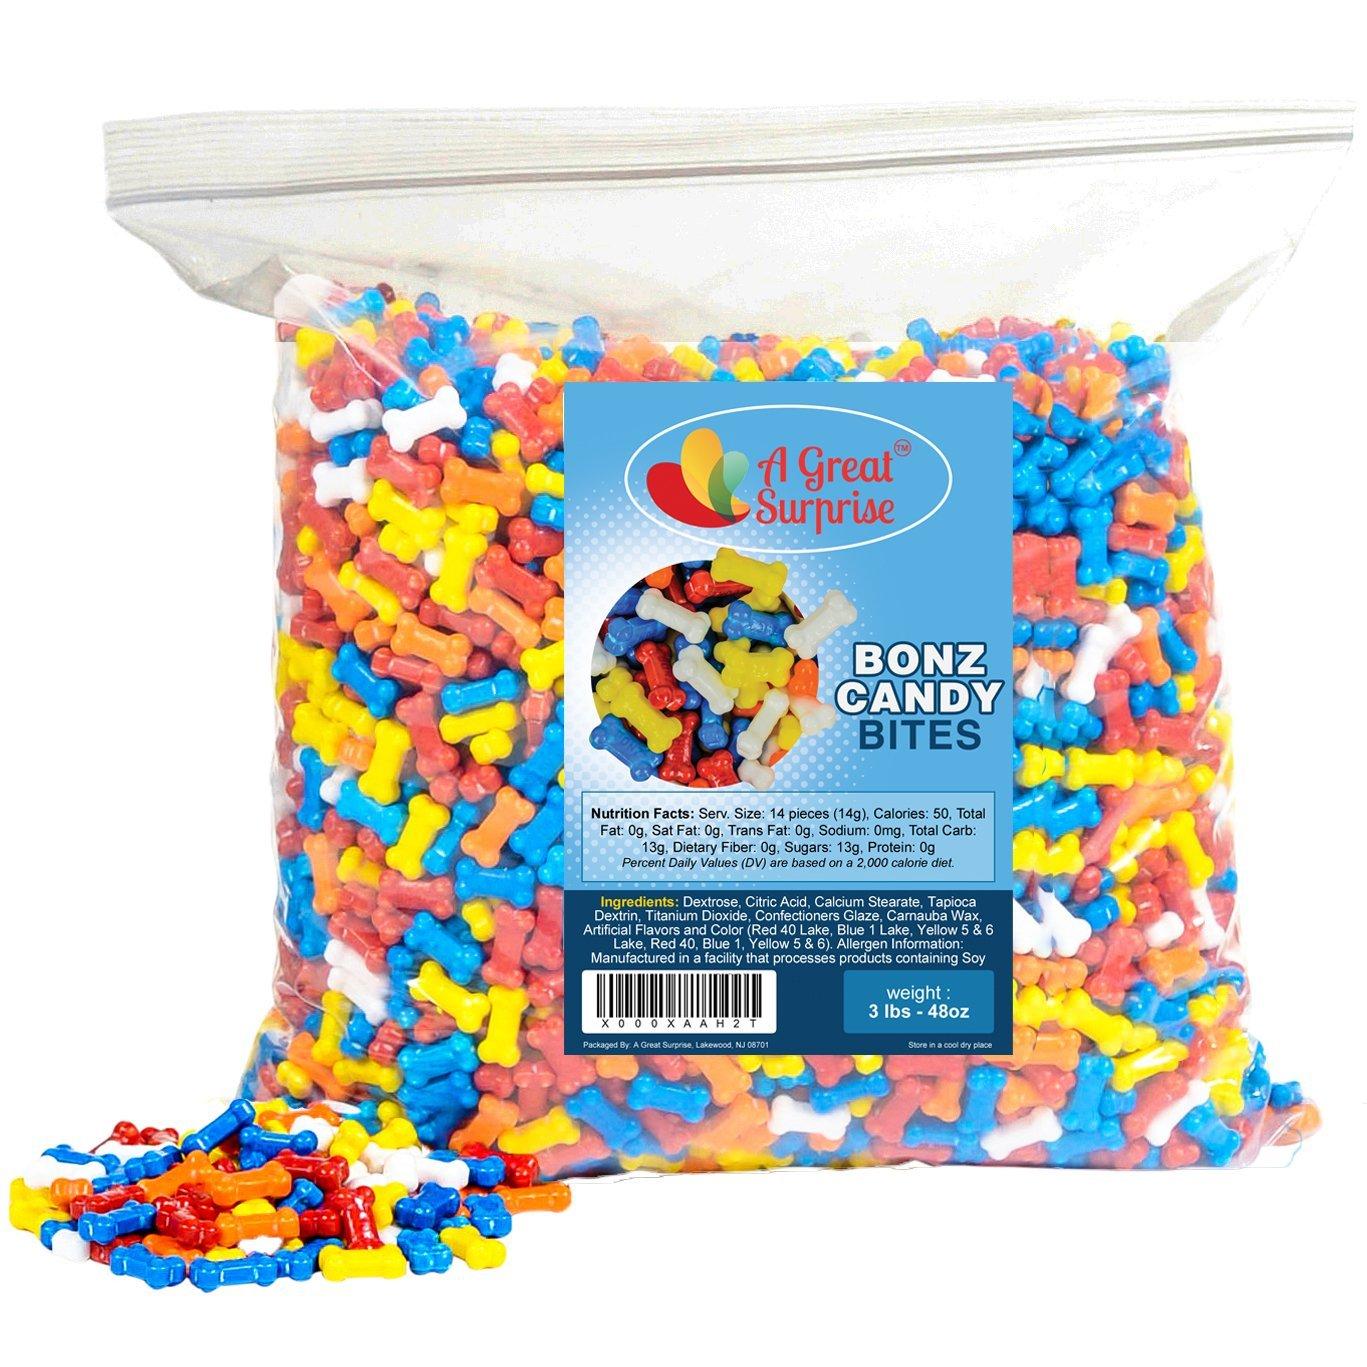 Amazon.com : Candy Bones - Candy Bonz - Dog Bone Shape Candy ...